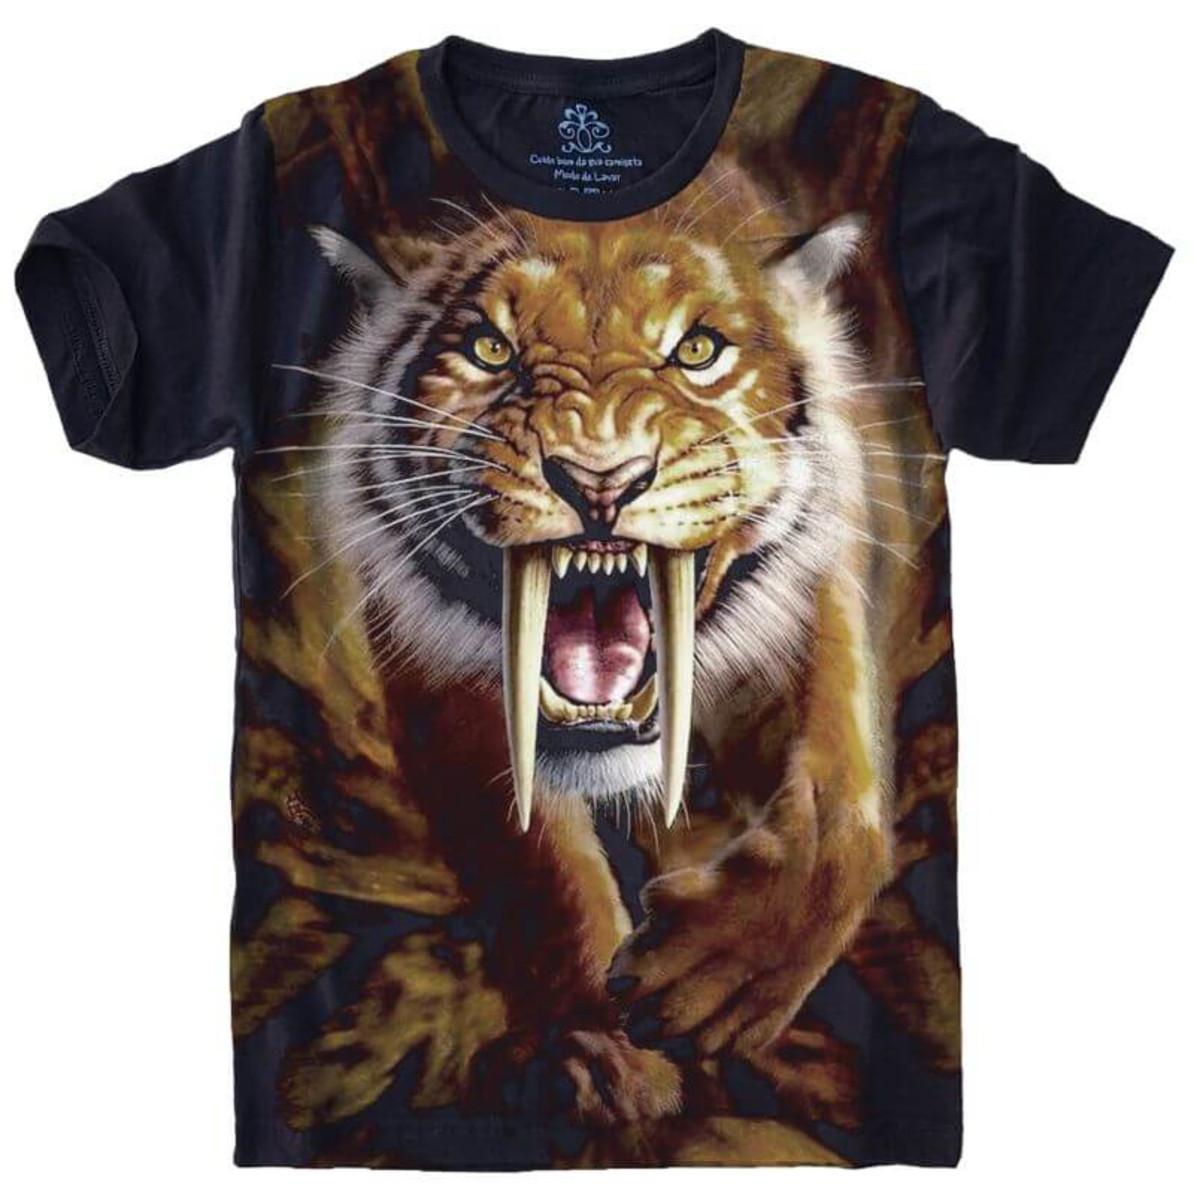 773d458567c5d Camiseta Tigre Dente de Sabre no Elo7 | CAMISETAS NERD STARK (F71F51)